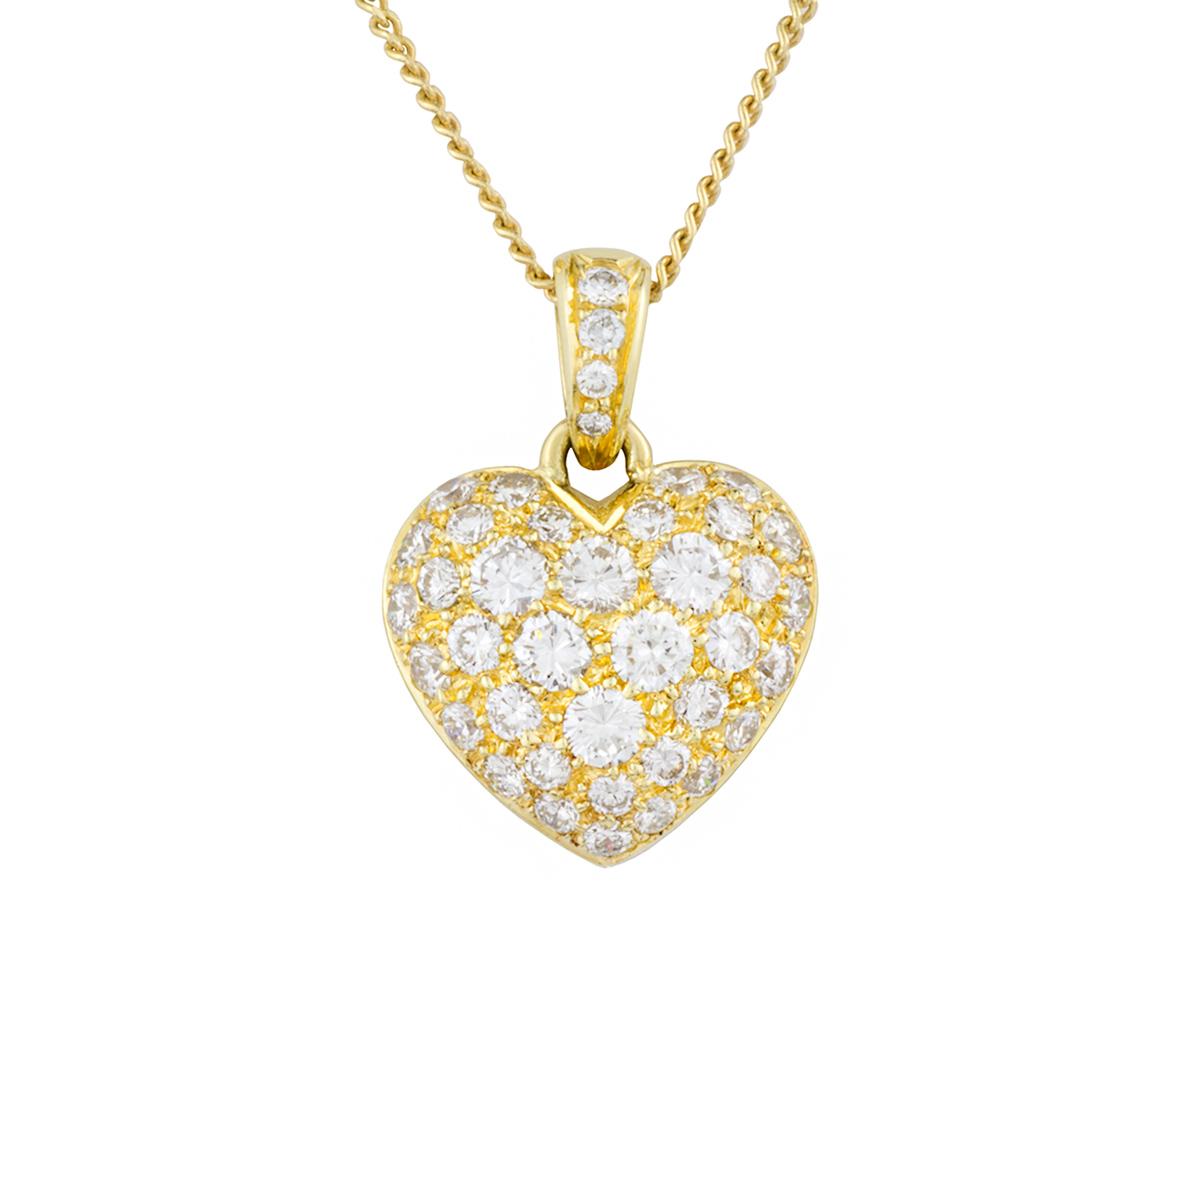 18k Yellow Gold Diamond Set Heart Pendant 0.80ct